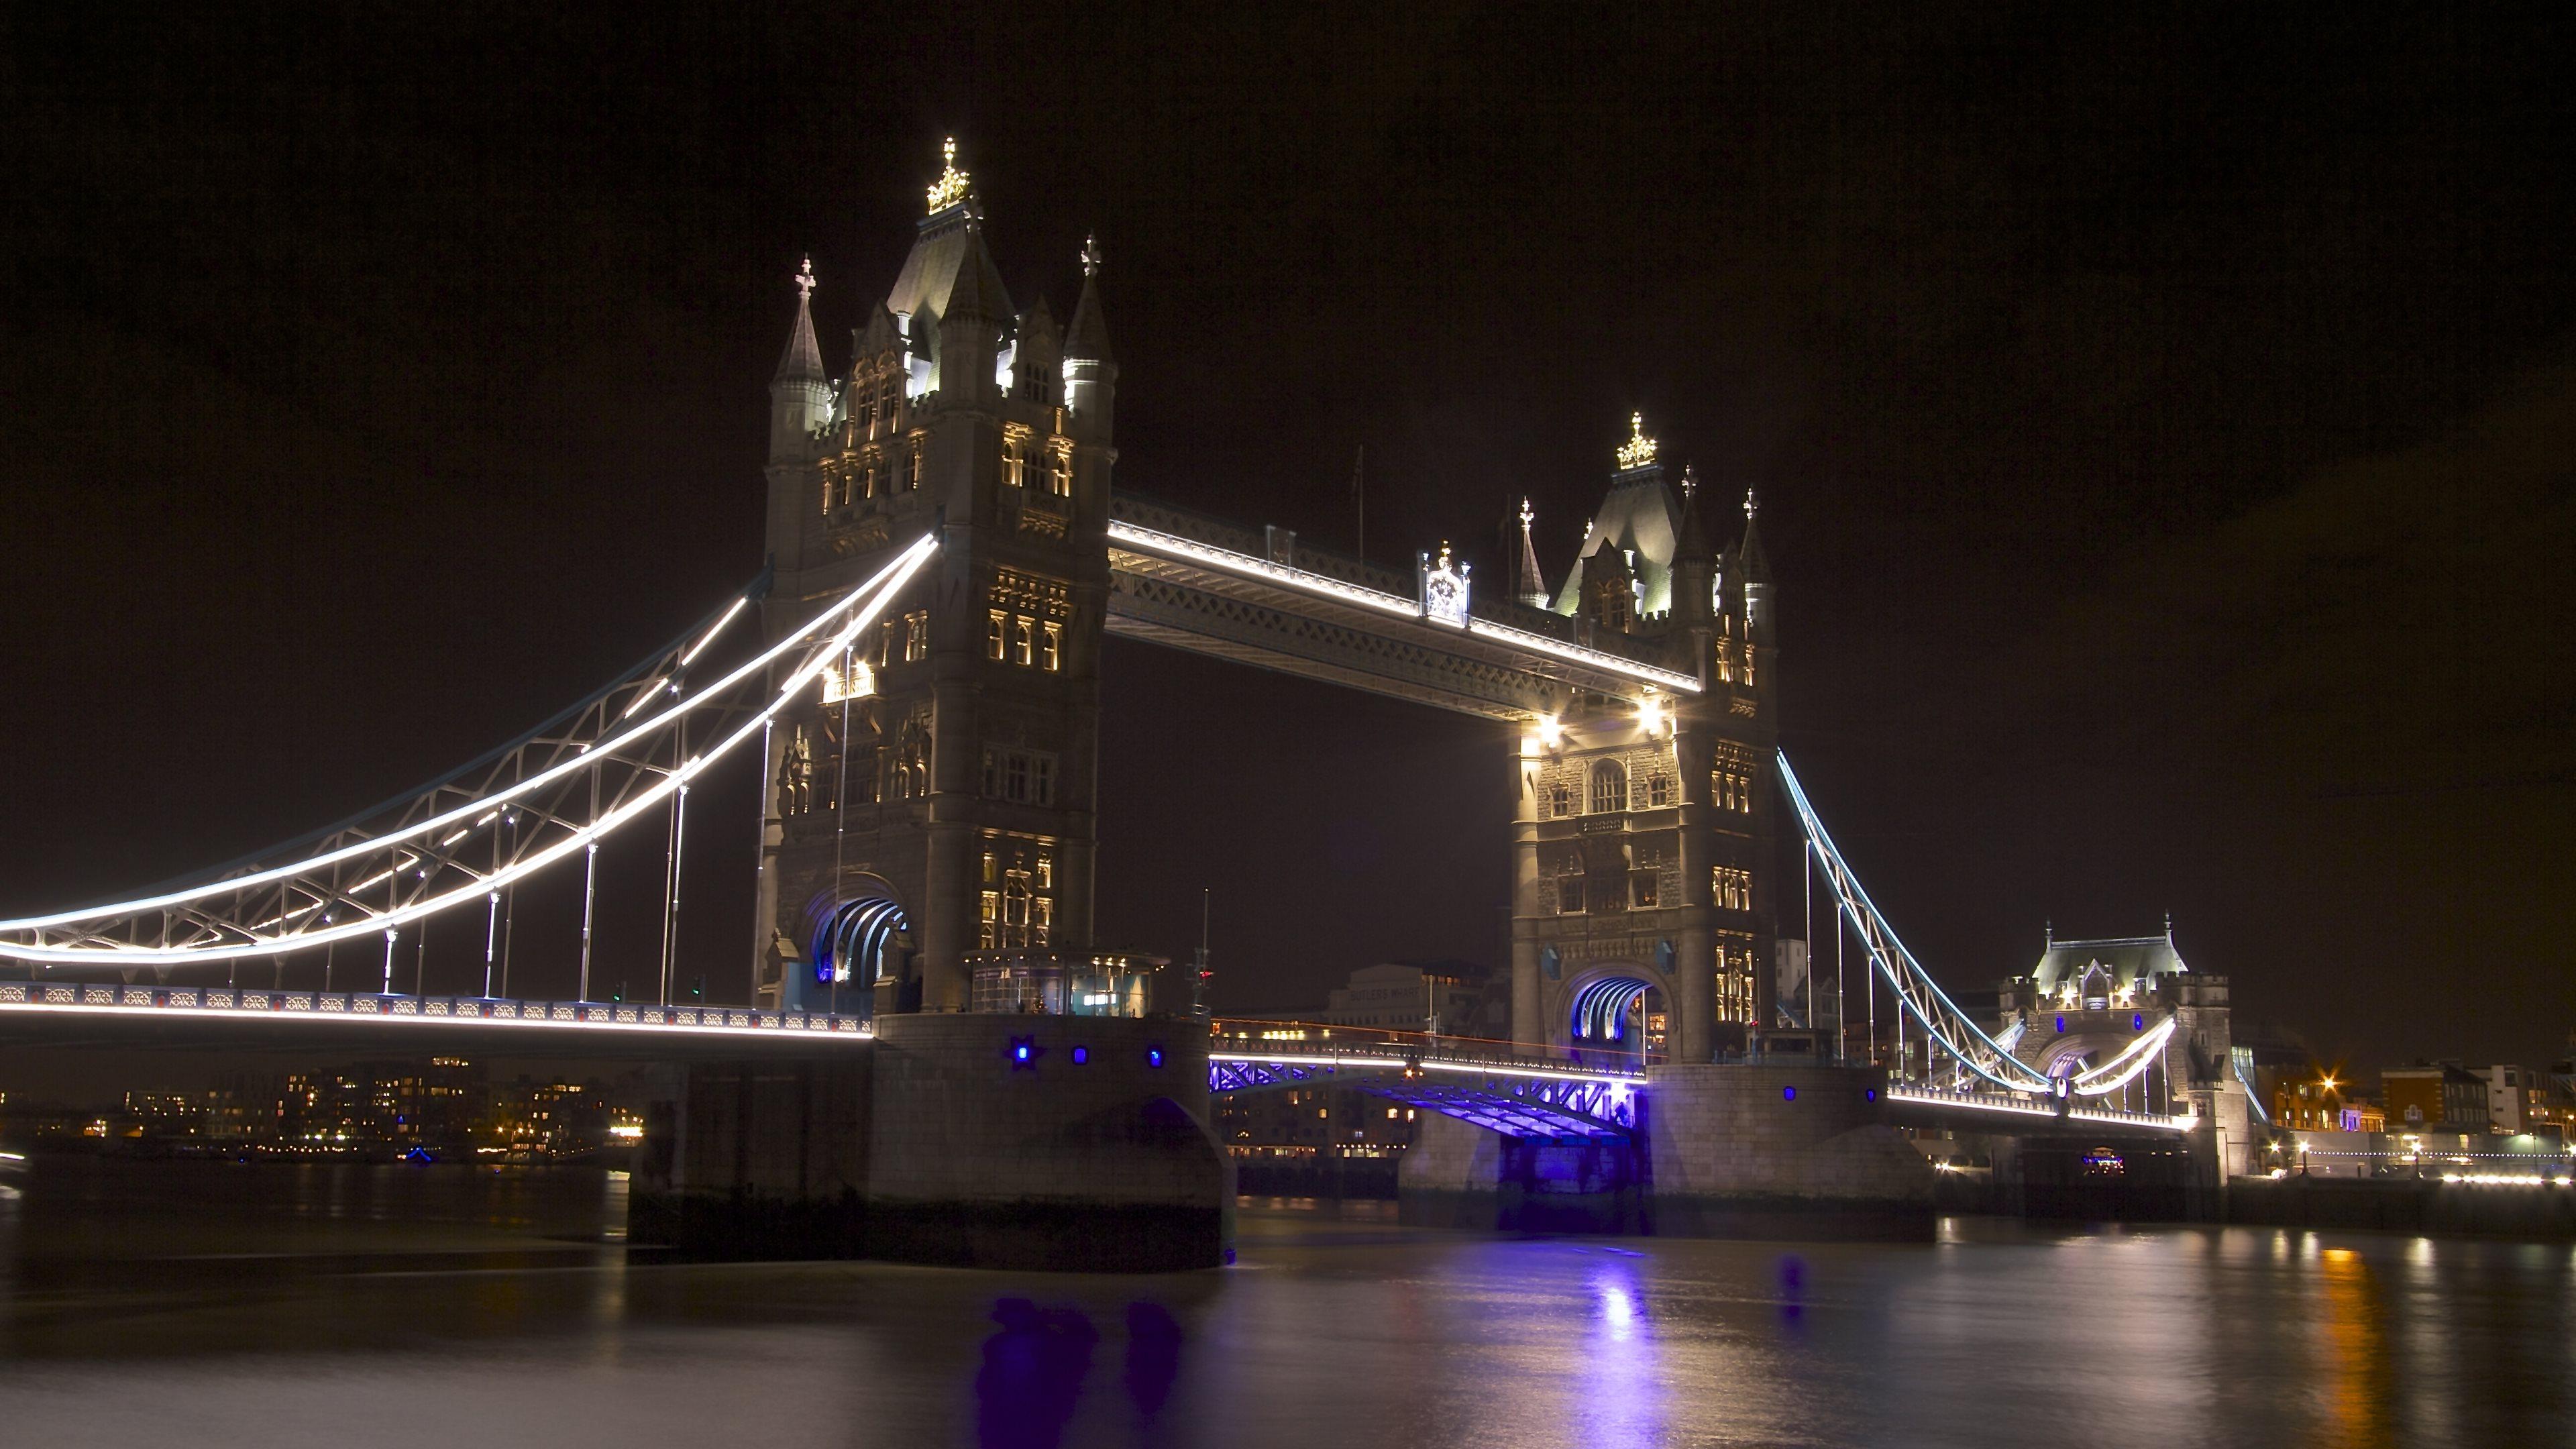 tower bridge at night wallpapers - tower bridge wallpaper 2 4 bridges hd backgrounds